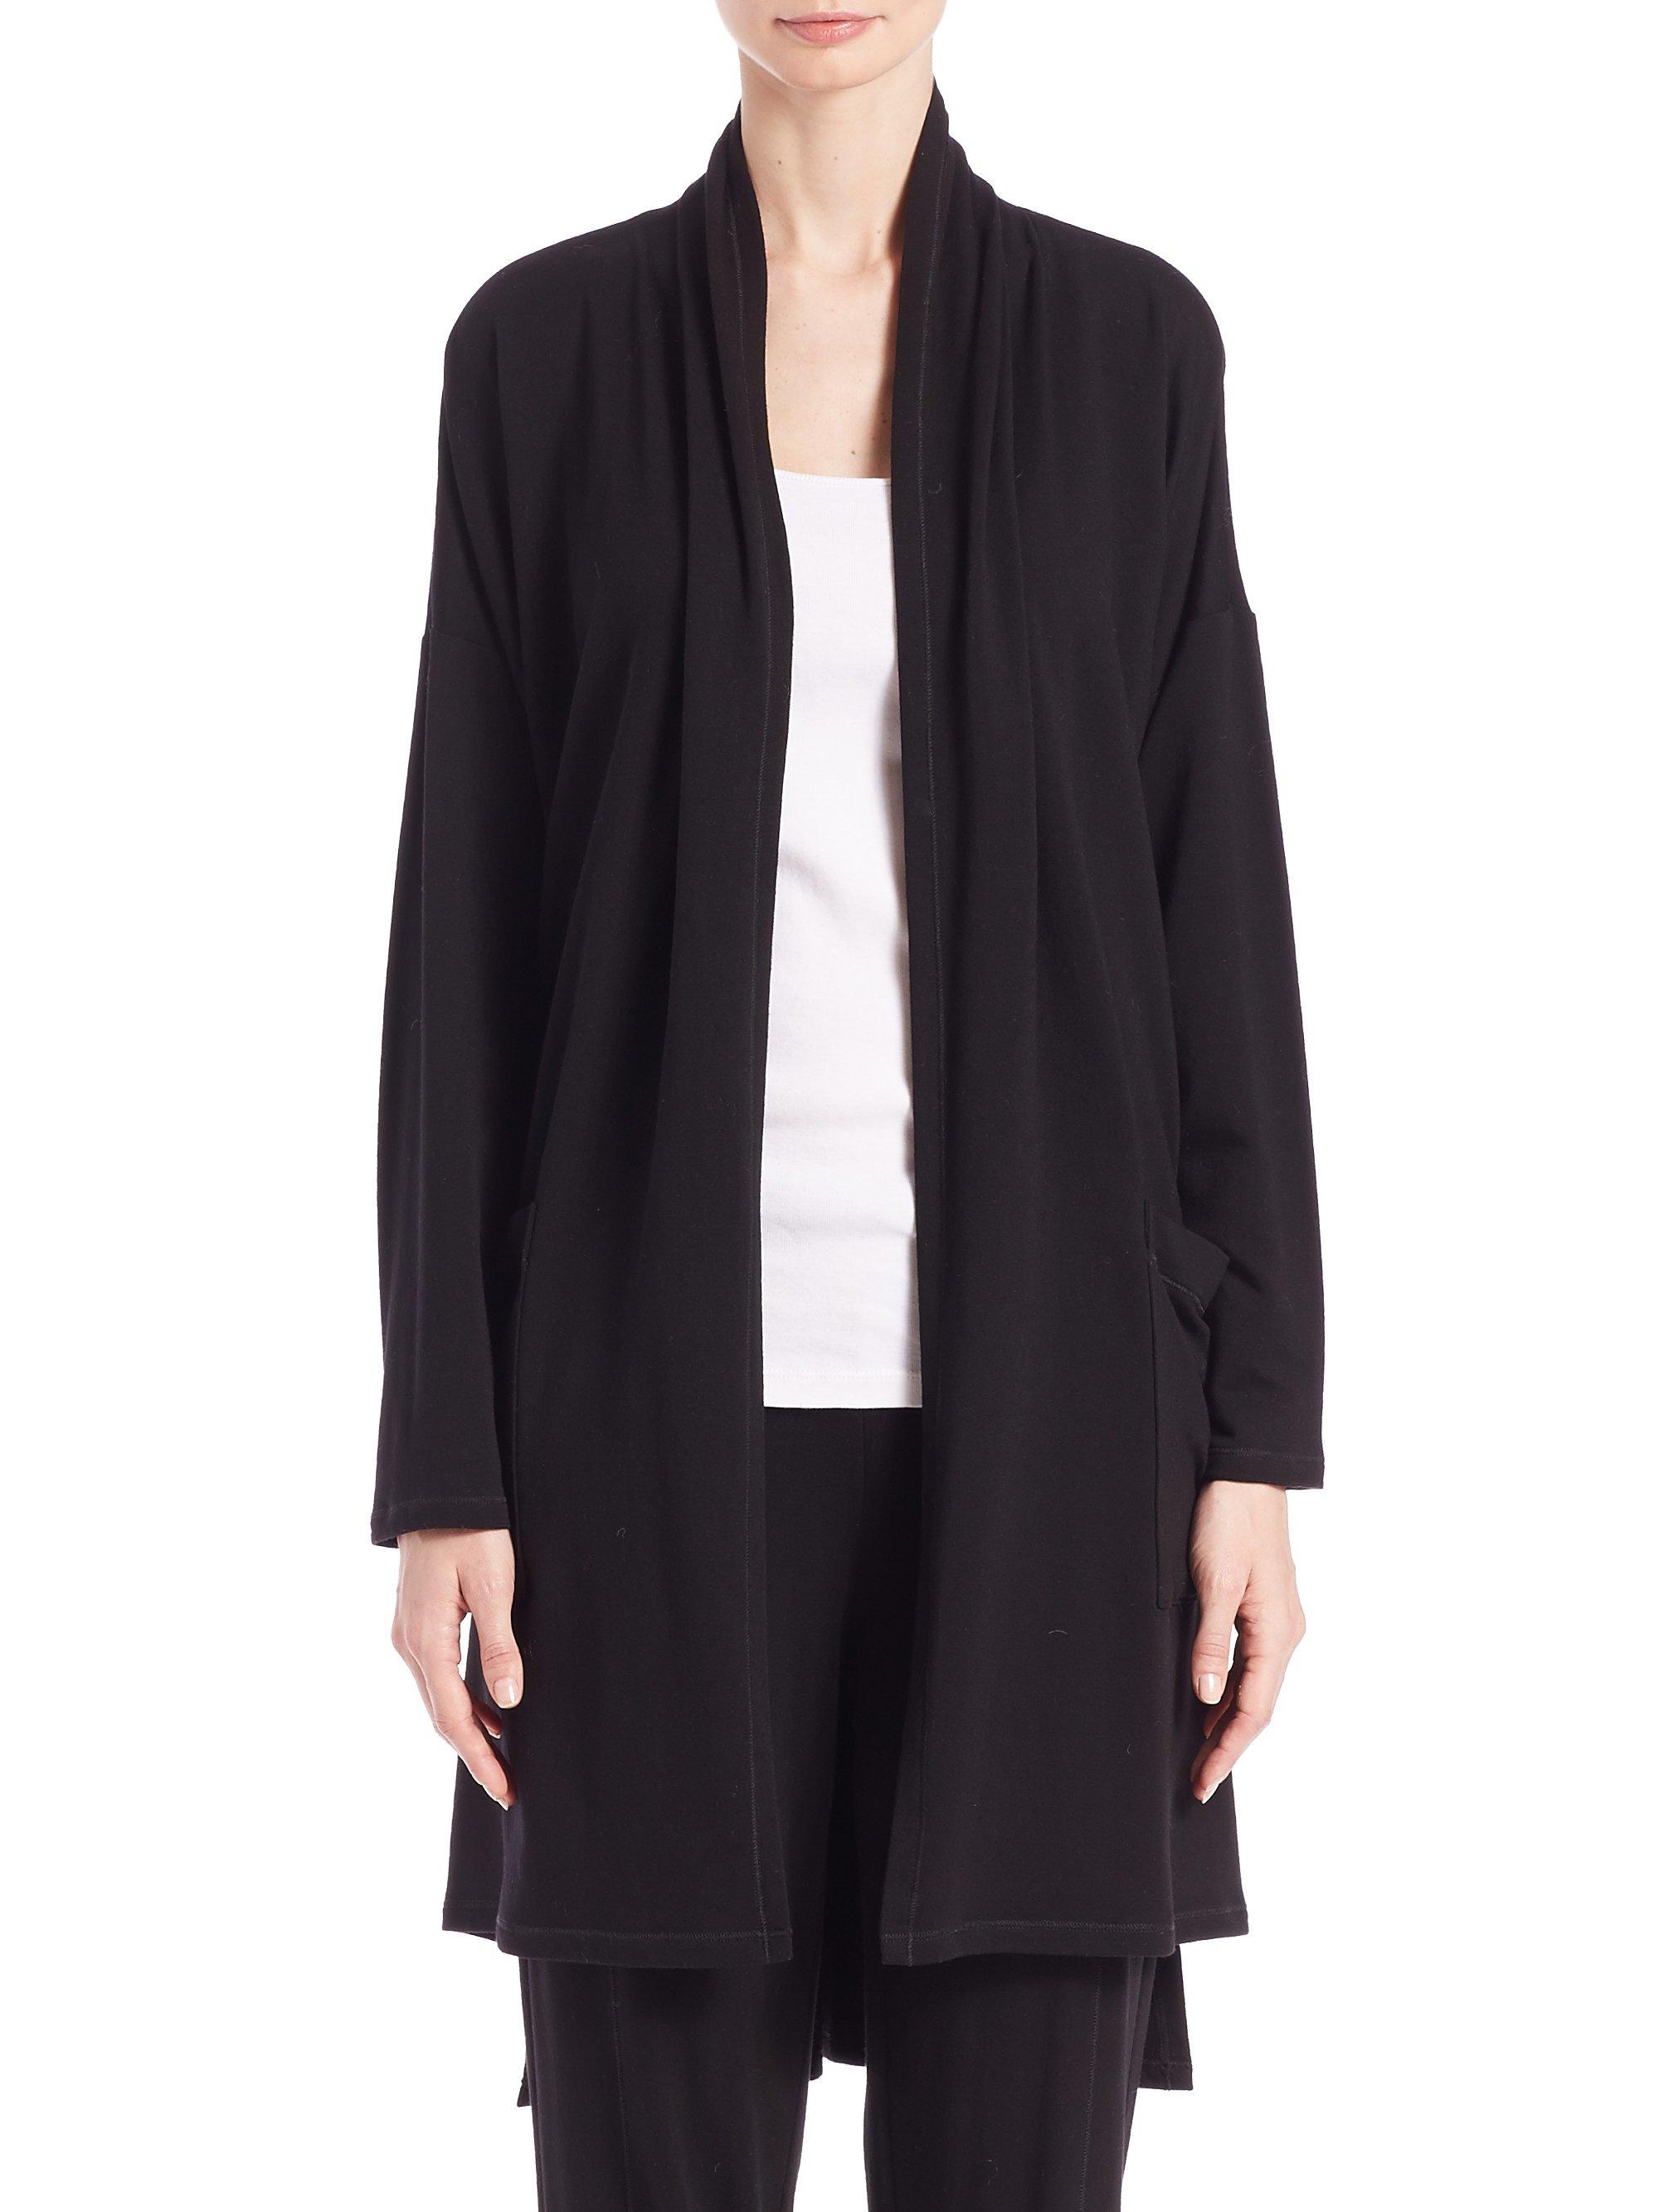 Eileen fisher Tencel Sweatshirt Cardigan in Black | Lyst